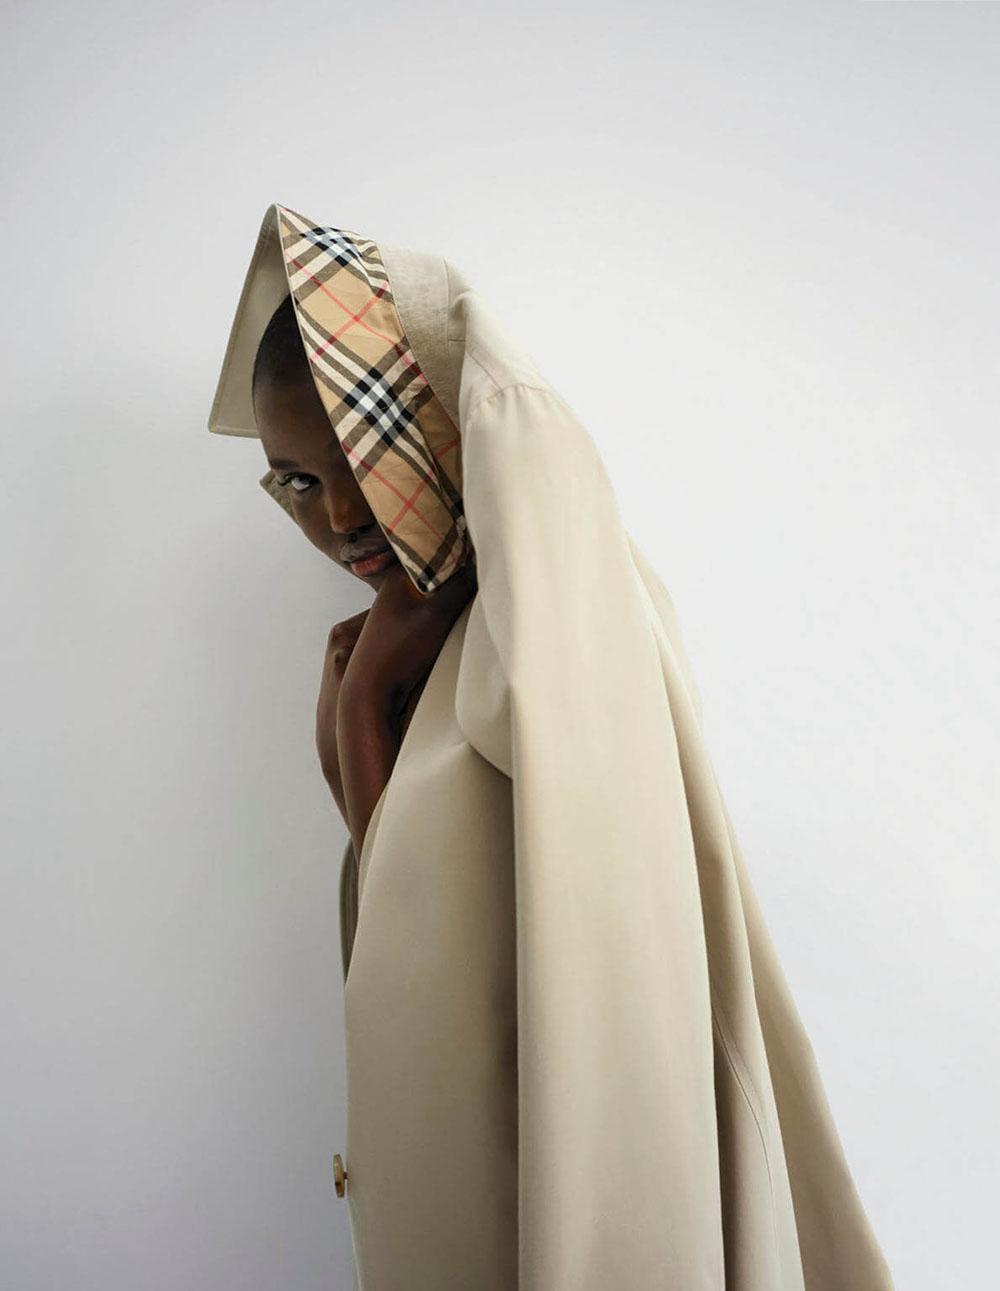 Kaia Gerber and Adut Akech by Bibi Cornejo Borthwick for Vogue US February 2020